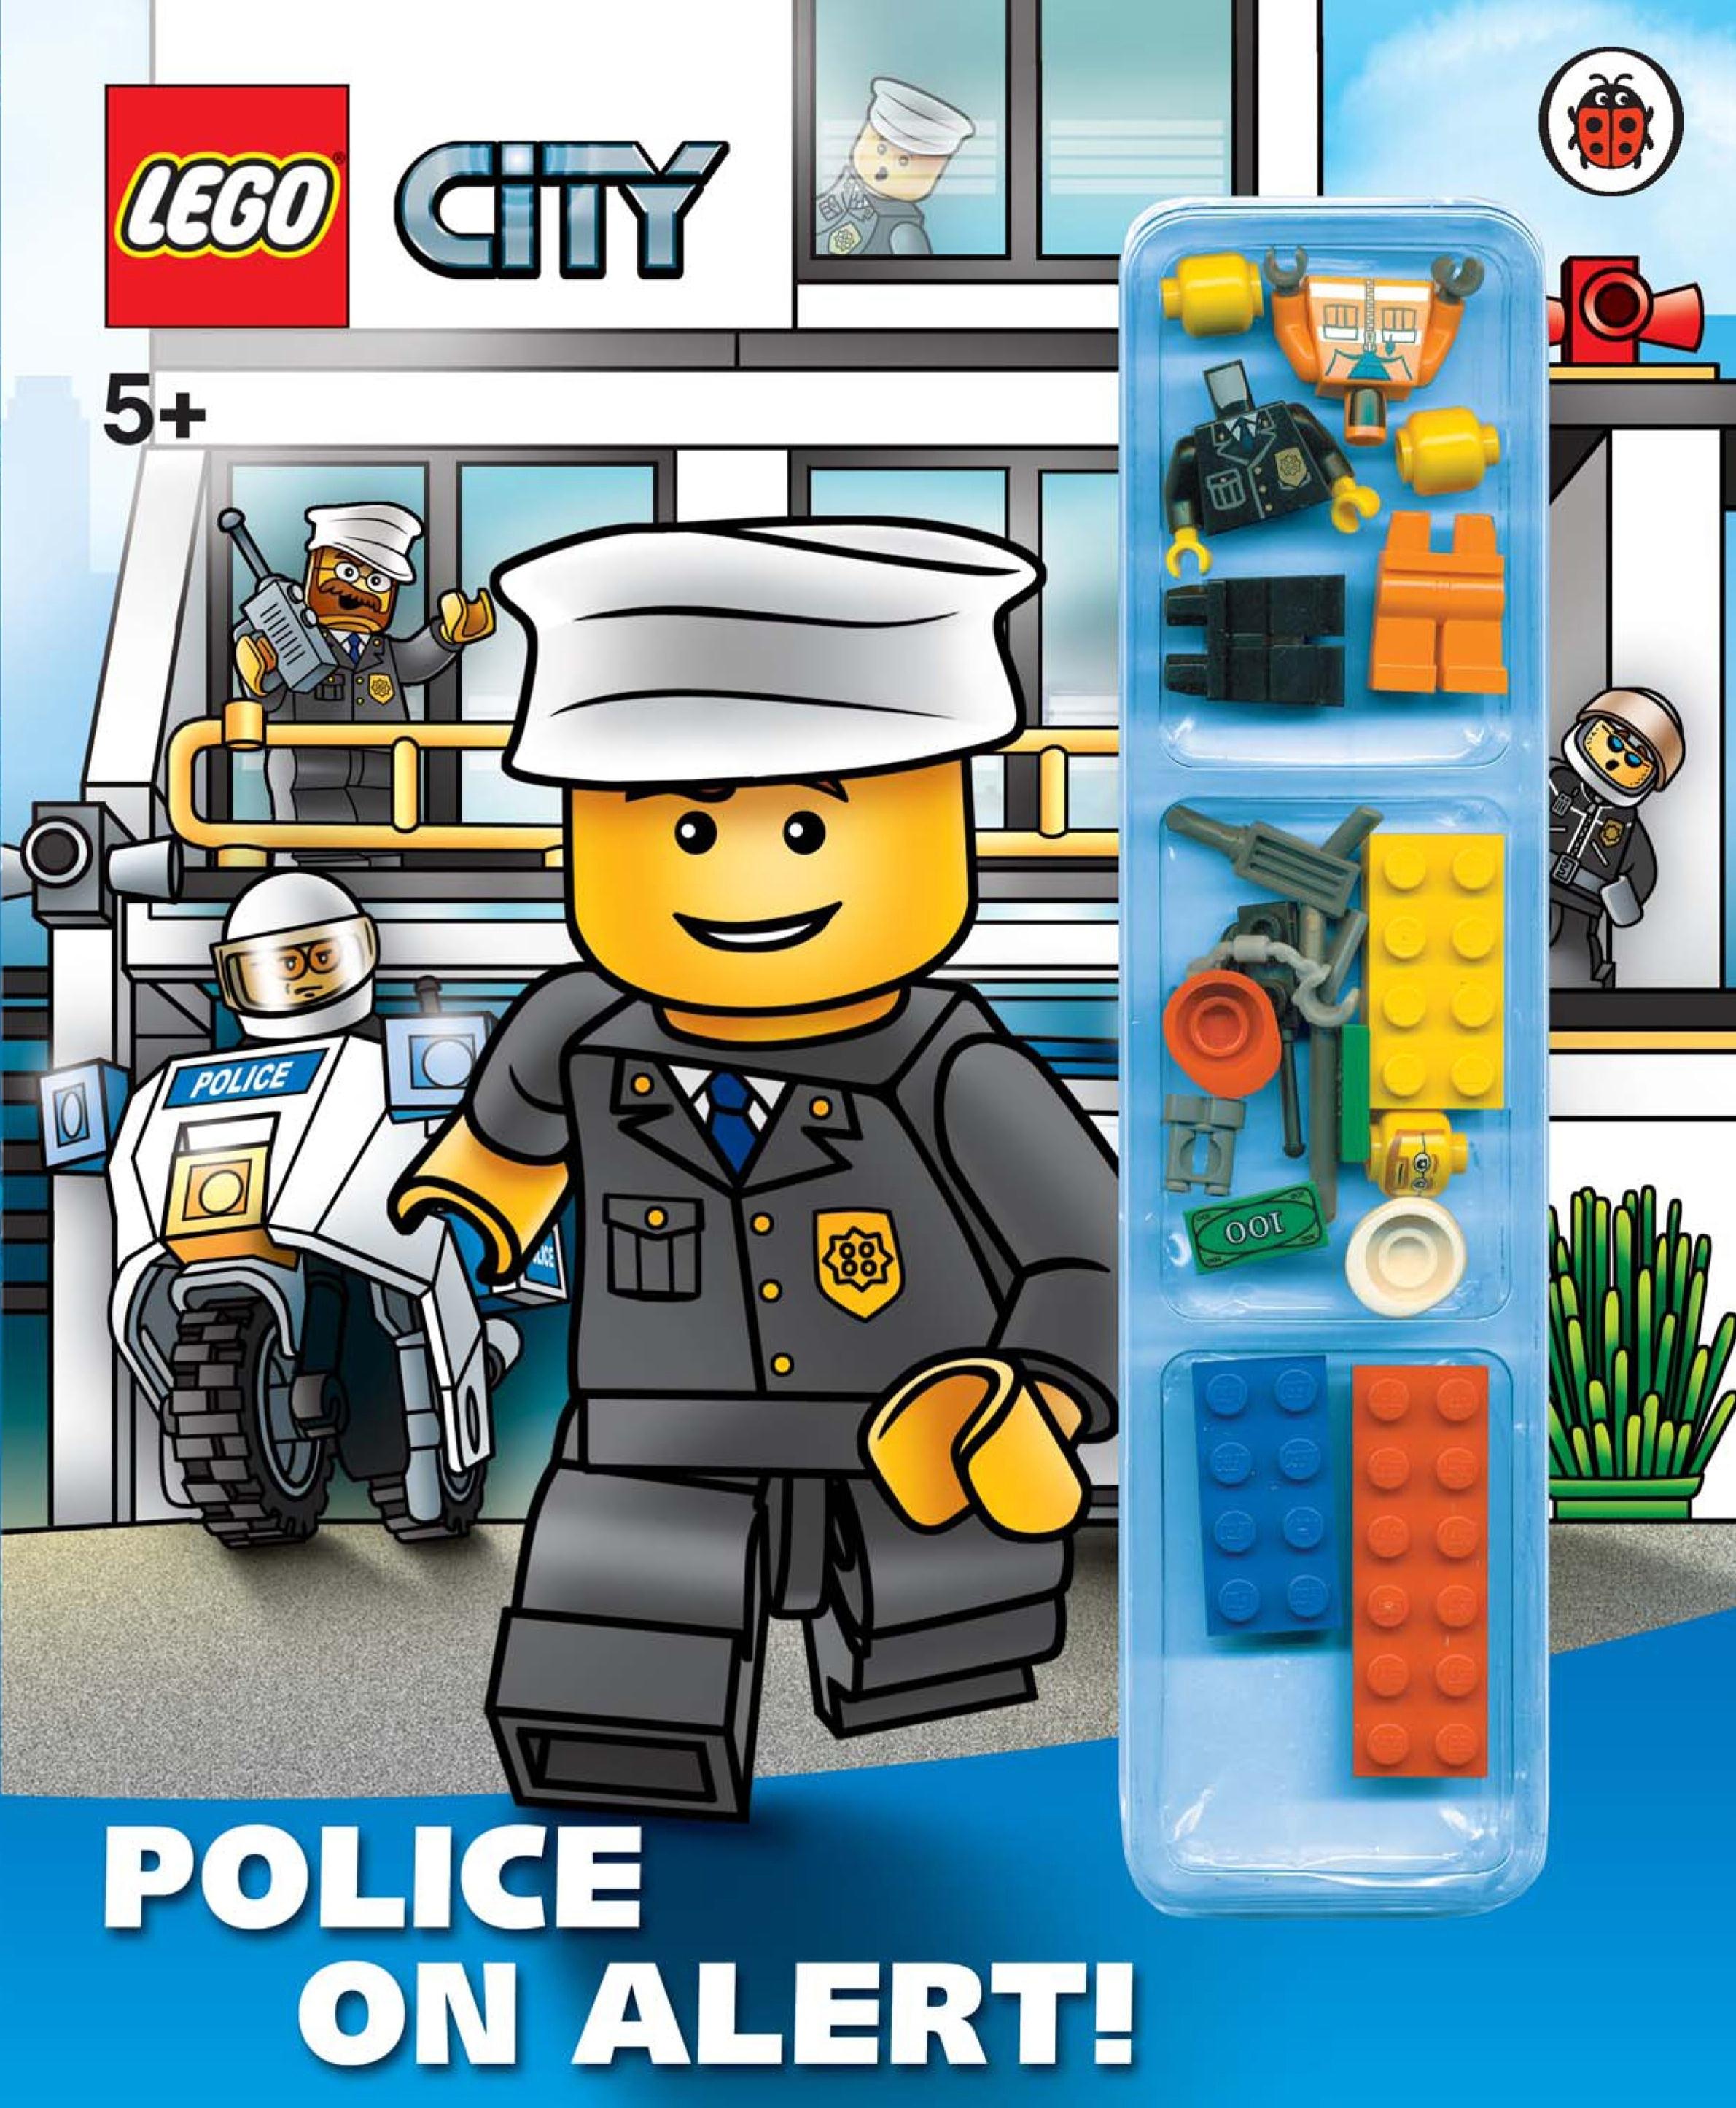 Lego City: Police on Alert!